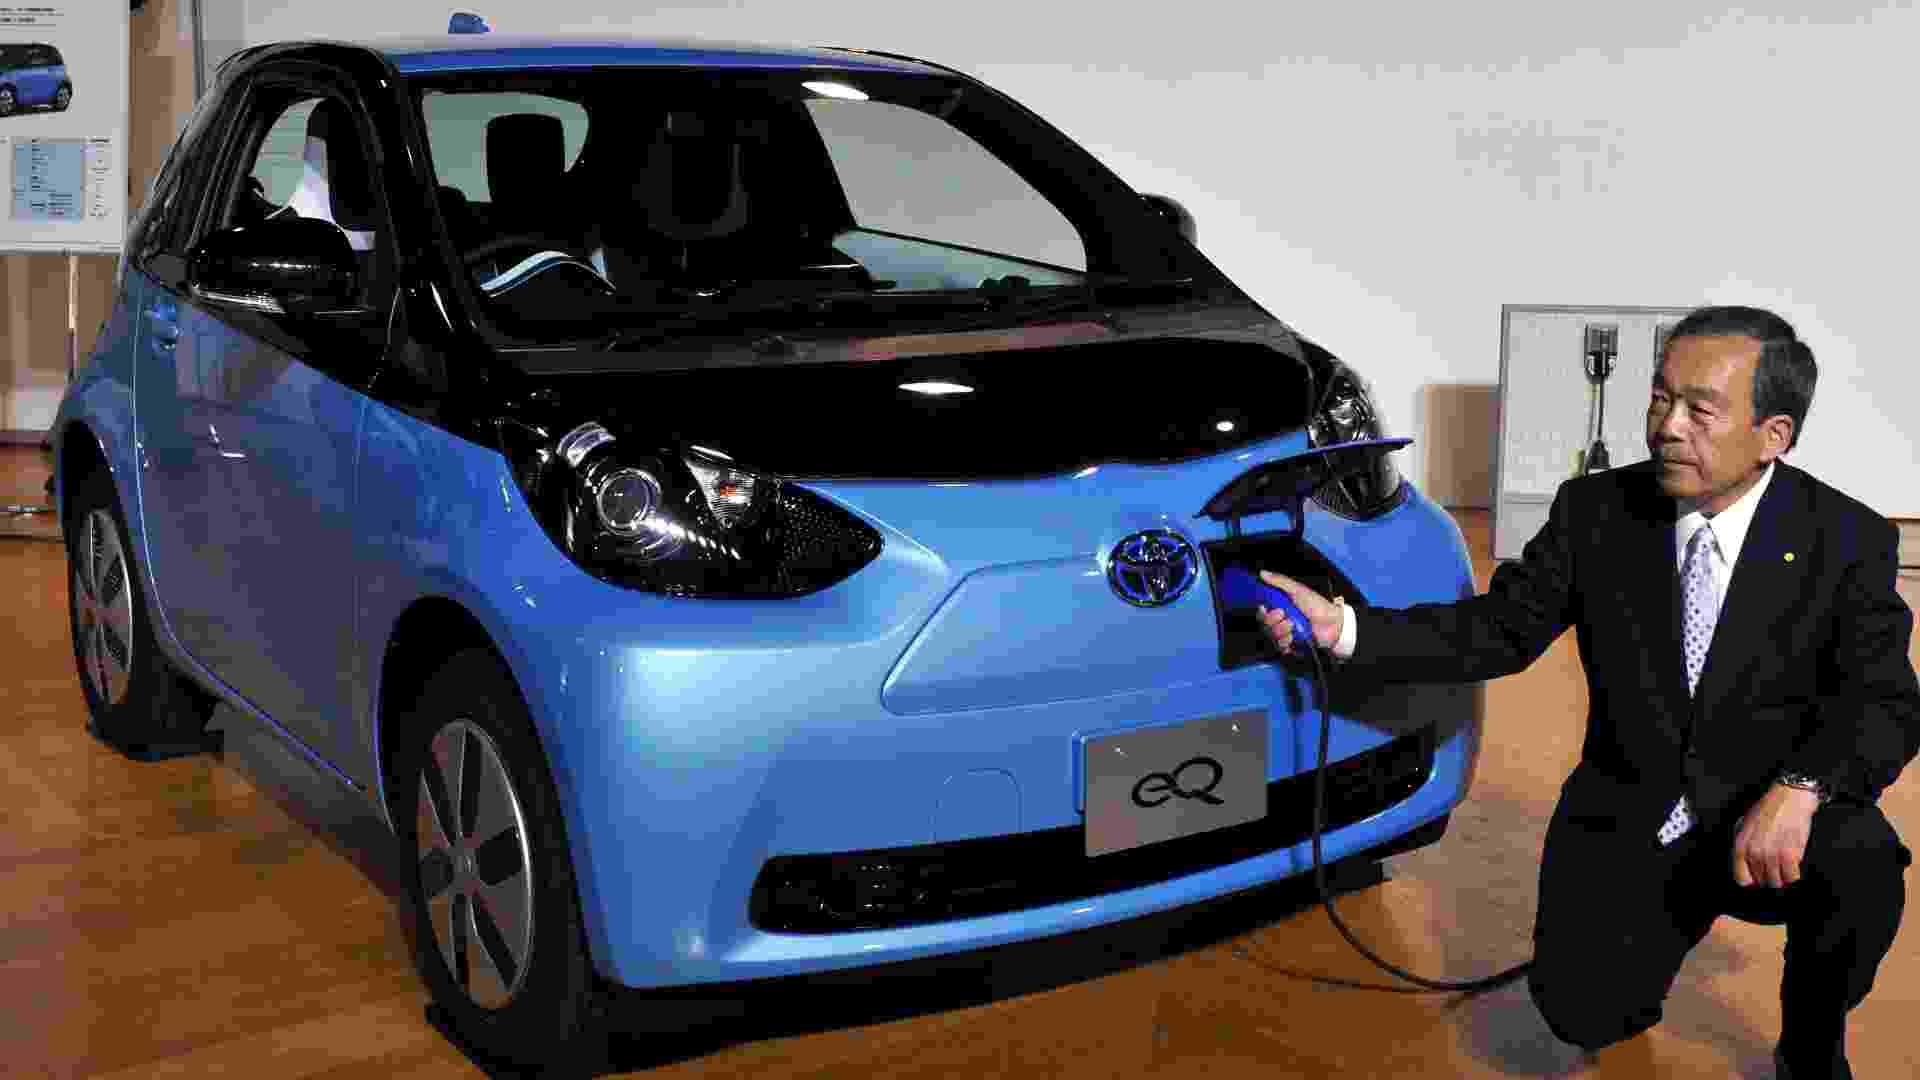 Toyota iQ EV, elétrico, promete autonomia de 85 km com desempenho de carro 1.0 - Yoshikazu Tsuno/AFP